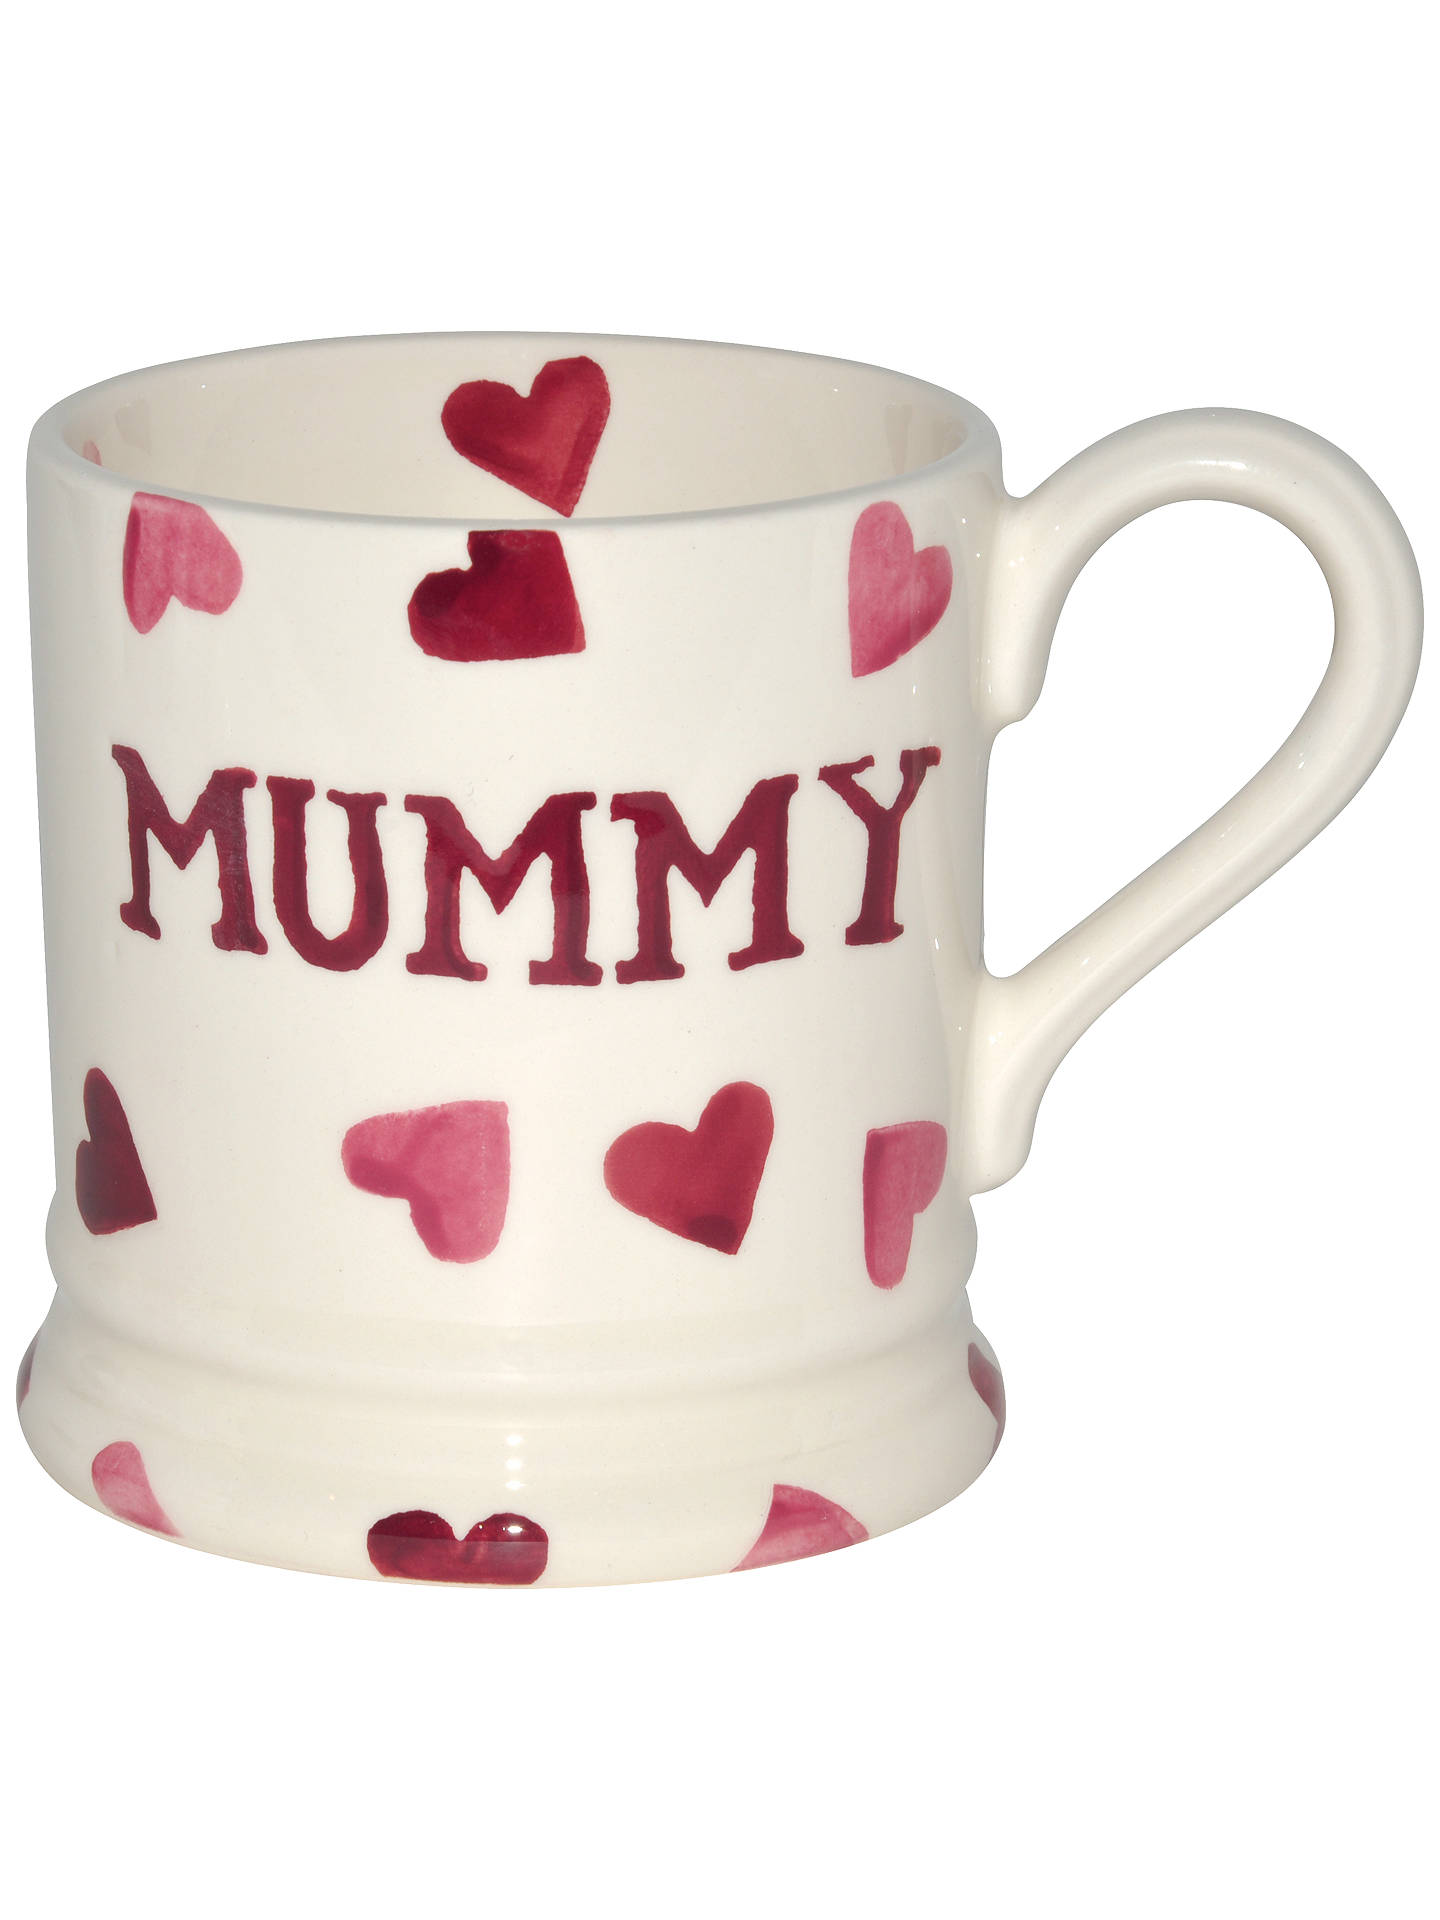 Emma Bridgewater Hearts Mummy Mug At John Lewis Amp Partners